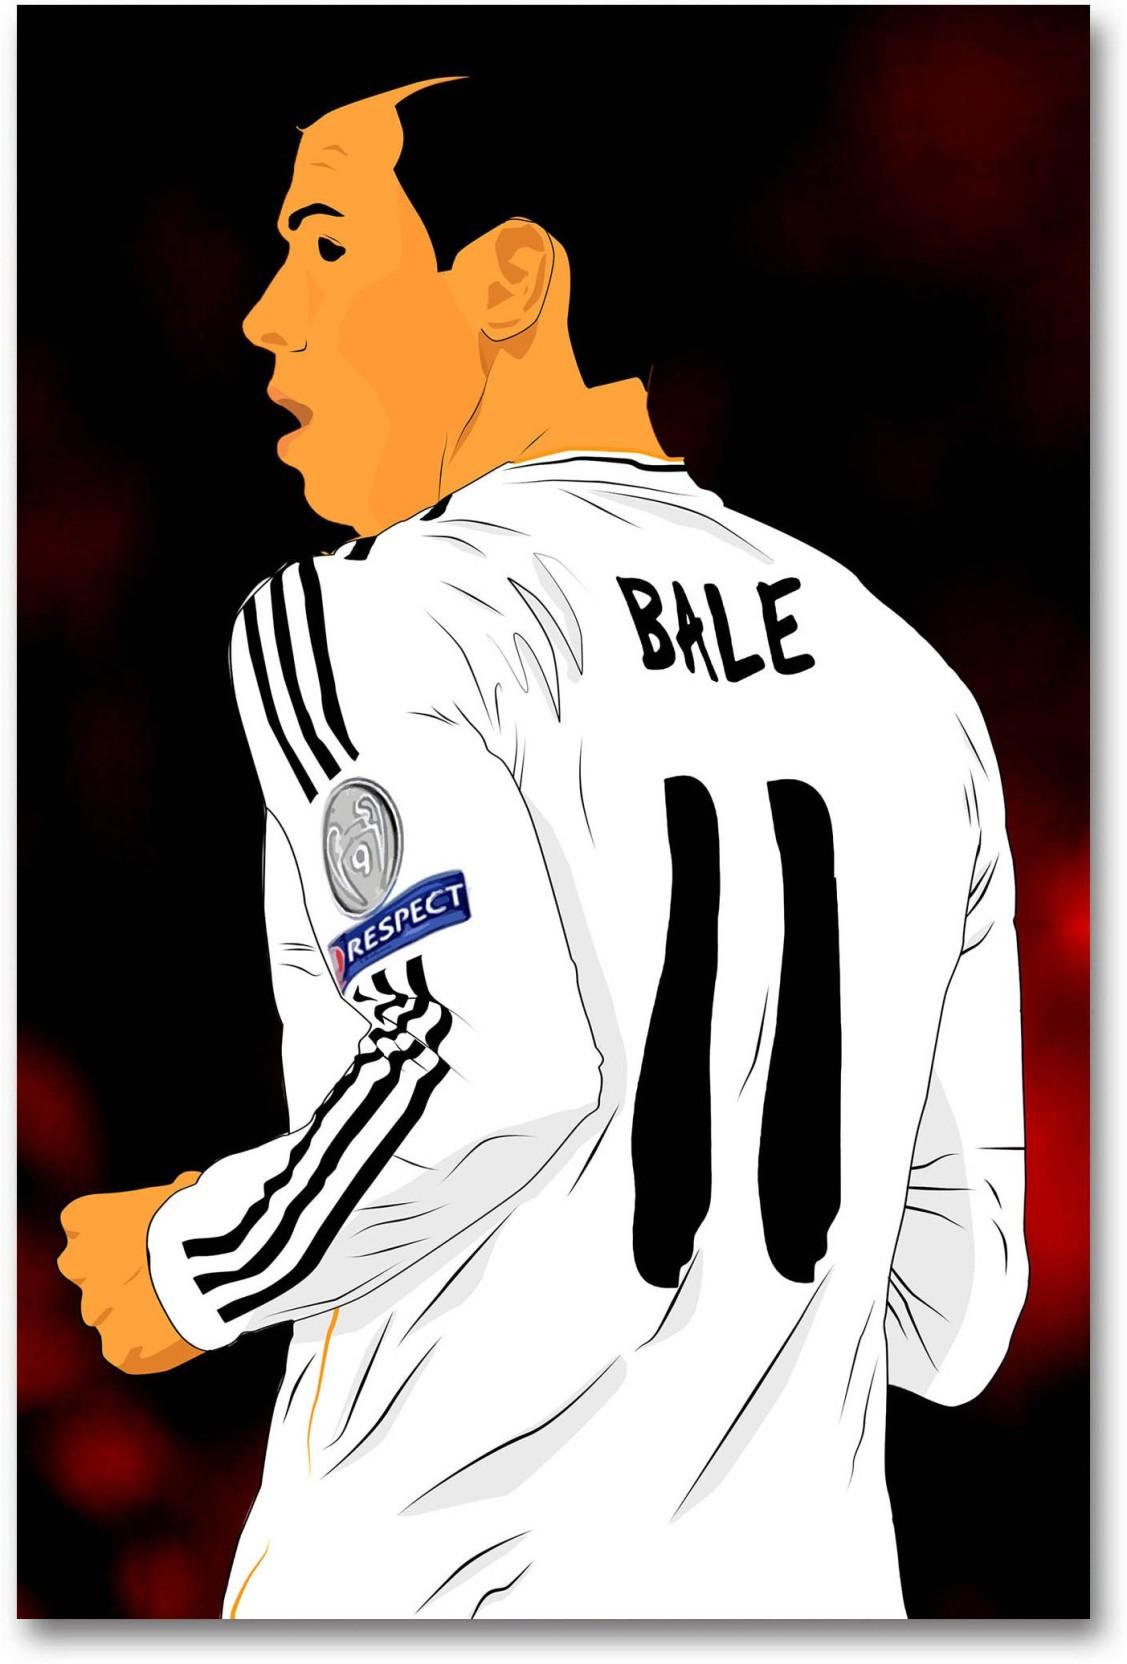 huge discount 1b3b3 76c3a Real Madrid C.F. Wall Poster - Gareth Bale - Fan Art - HD ...